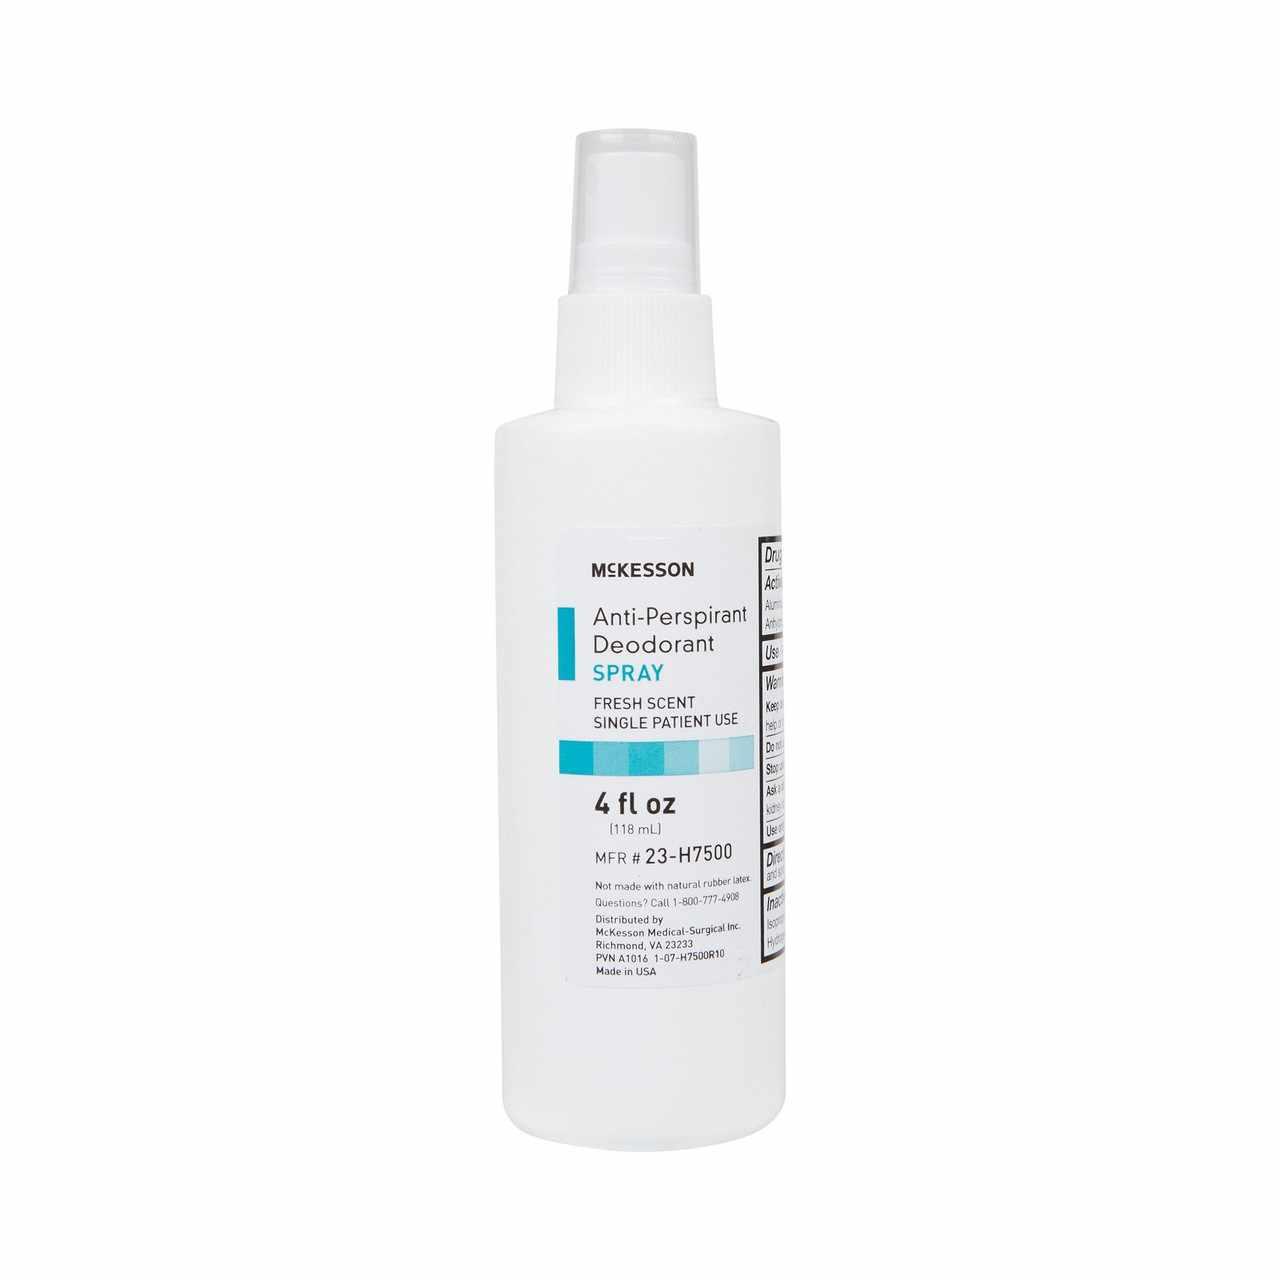 McKesson Antiperspirant / Deodorant Spray 4 oz. Fresh Scent